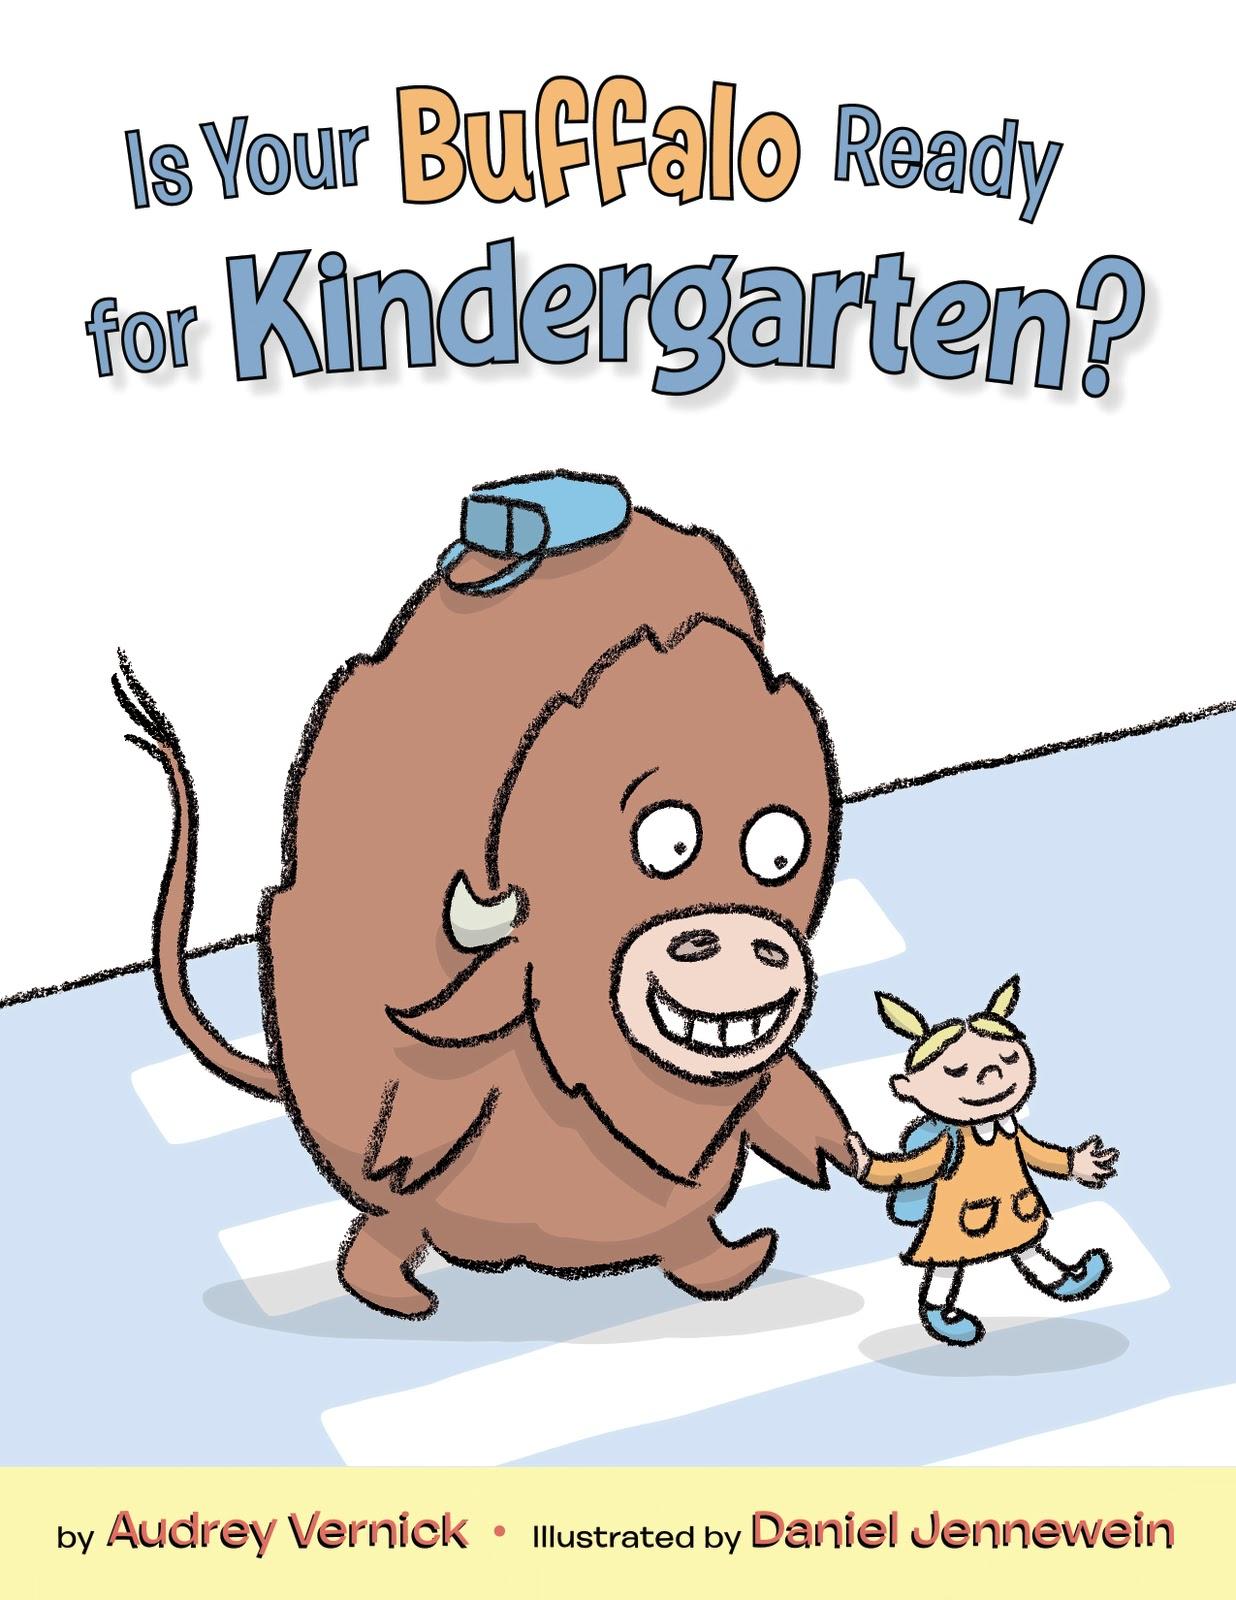 http://3.bp.blogspot.com/_A4X7aRy4TmA/TSHCf65vlNI/AAAAAAAADJ4/qt6x1Bz2K_Y/s1600/Buffalo_Kindergarten_Cover.jpg